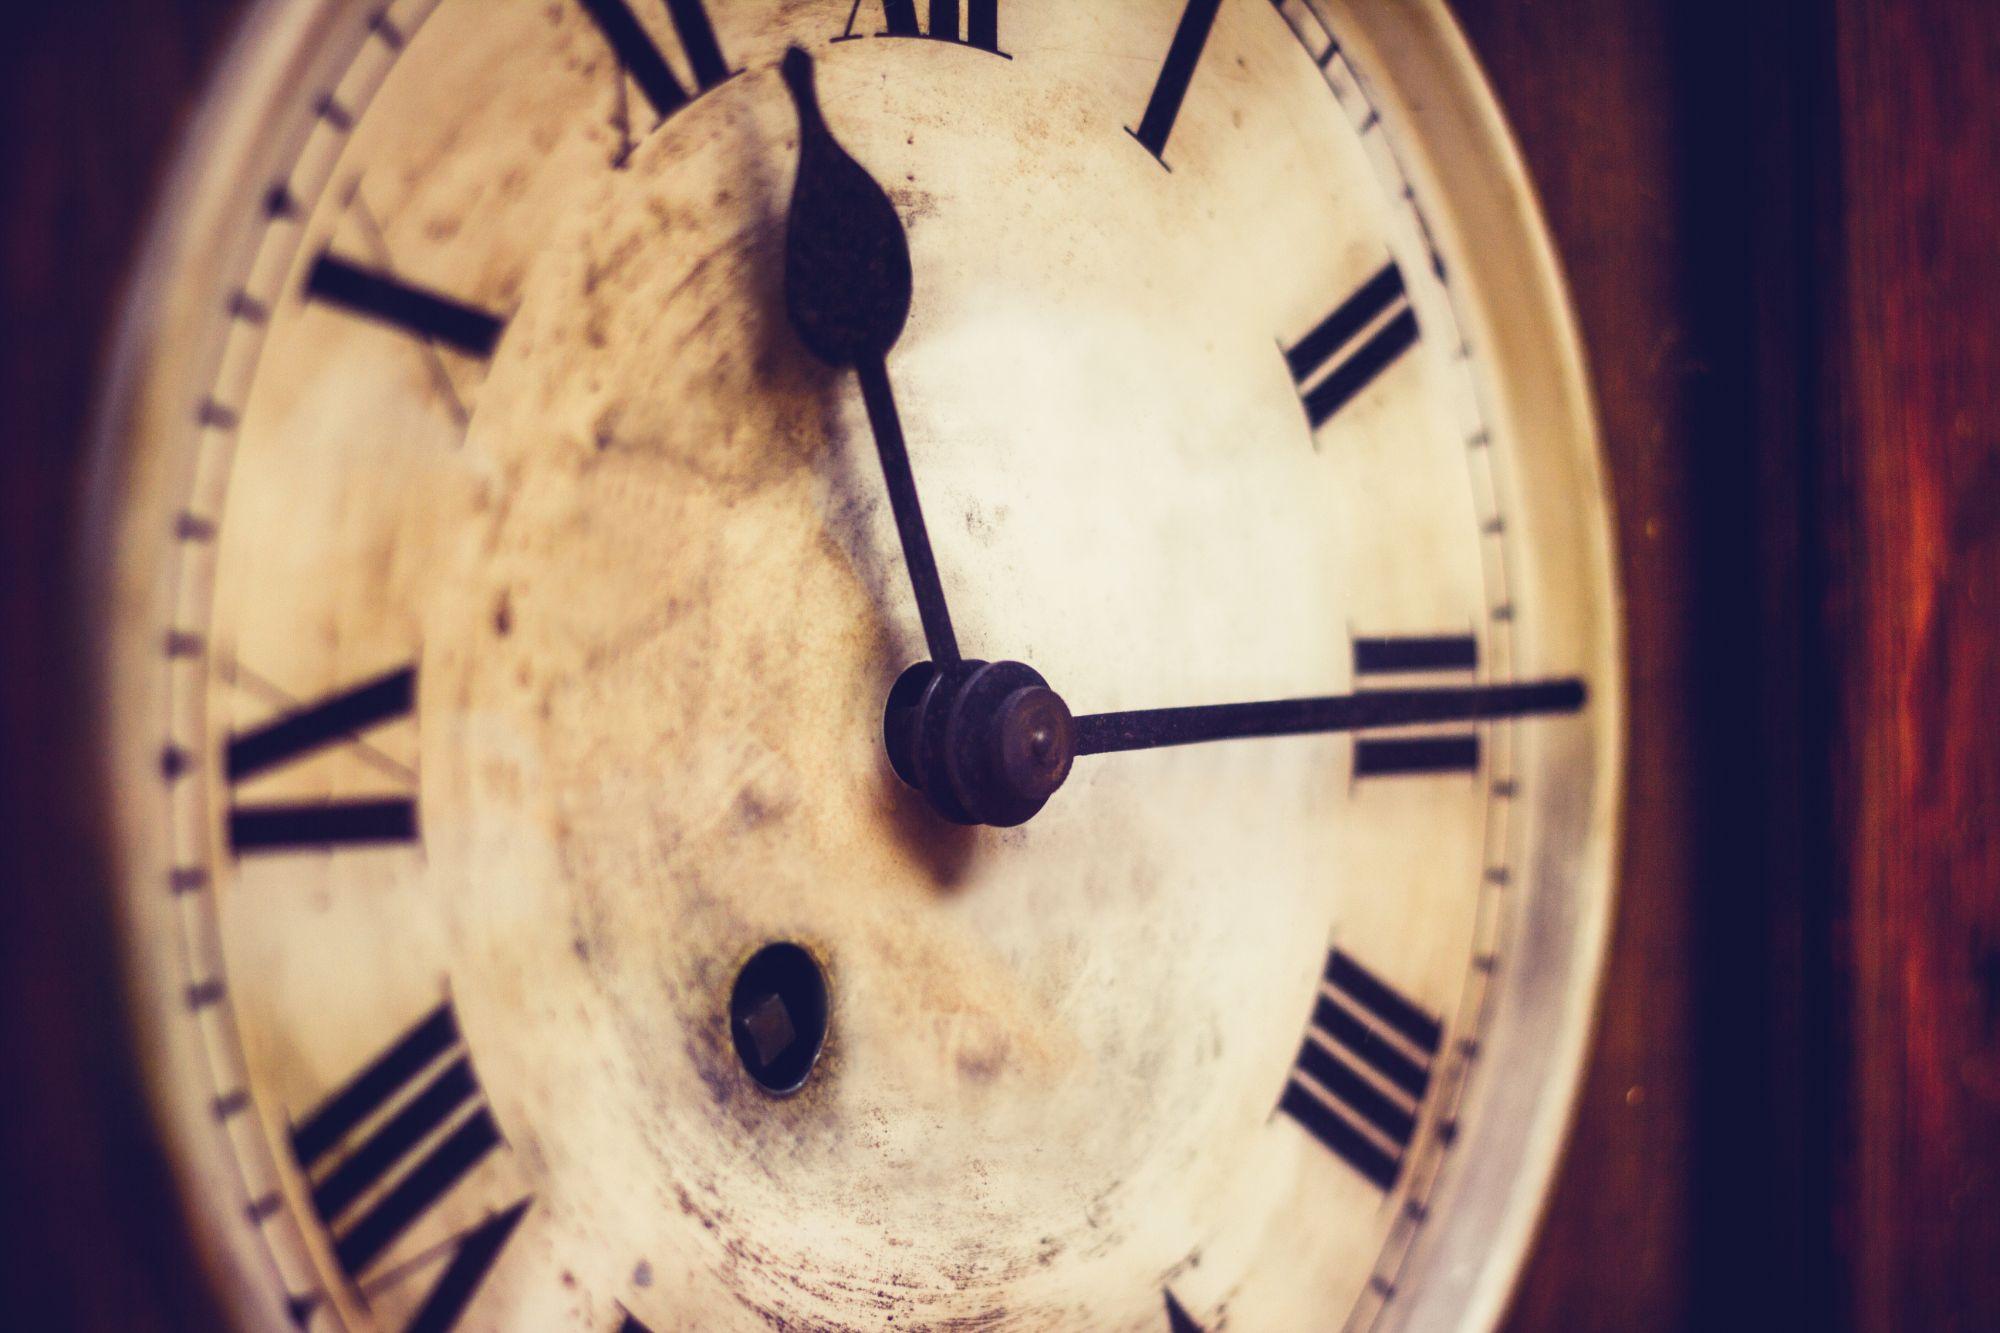 Timepiece restoration in St. Louis, MO